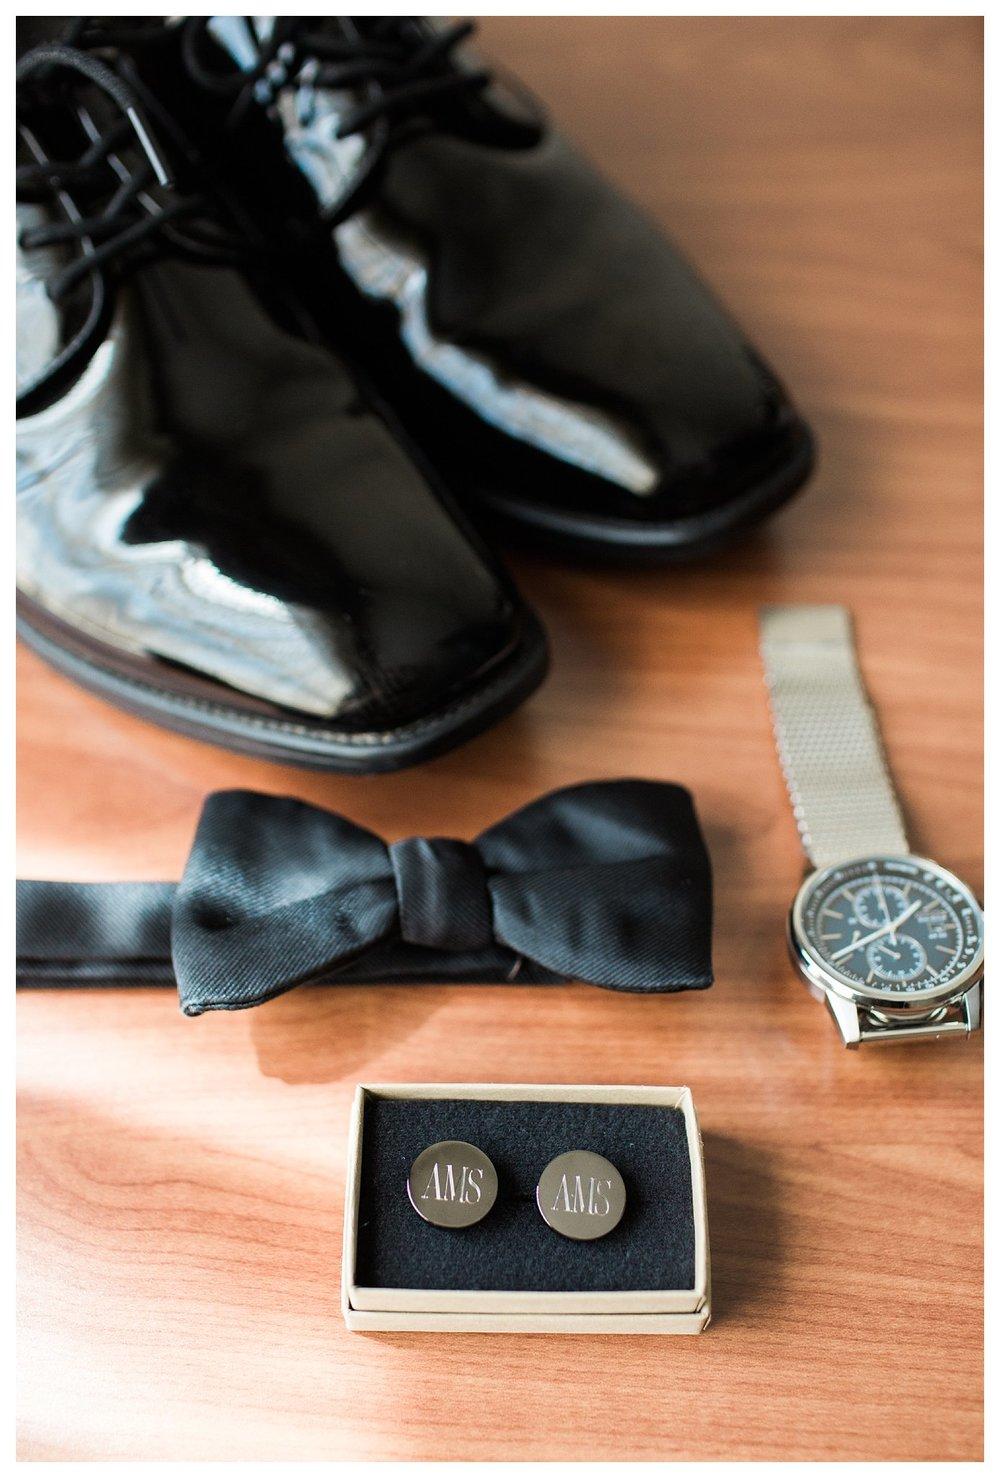 rhinegeist-wedding-everleigh-photography-cincinnati-wedding-photographer-the-singhoff-wedding-11